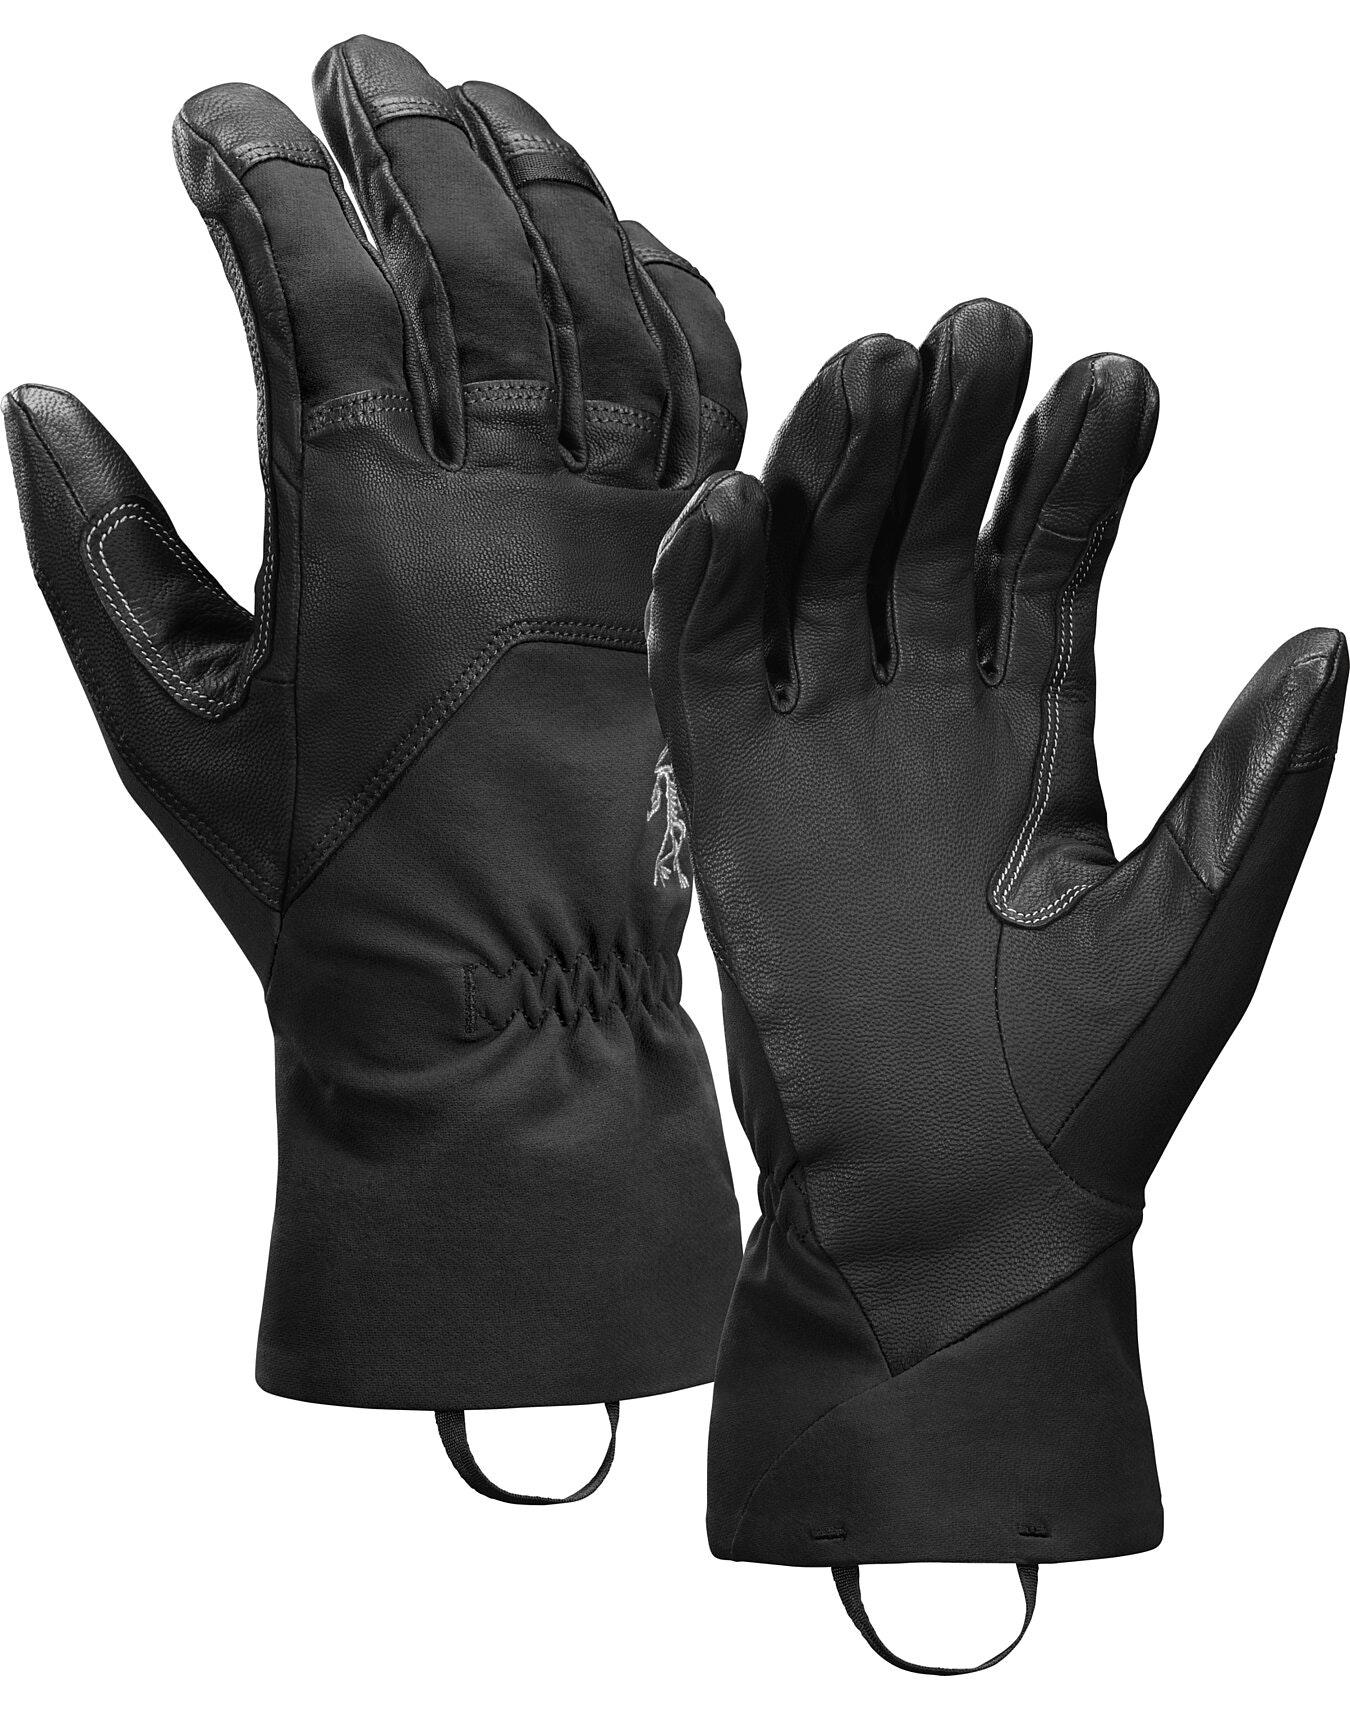 Rope Glove Black